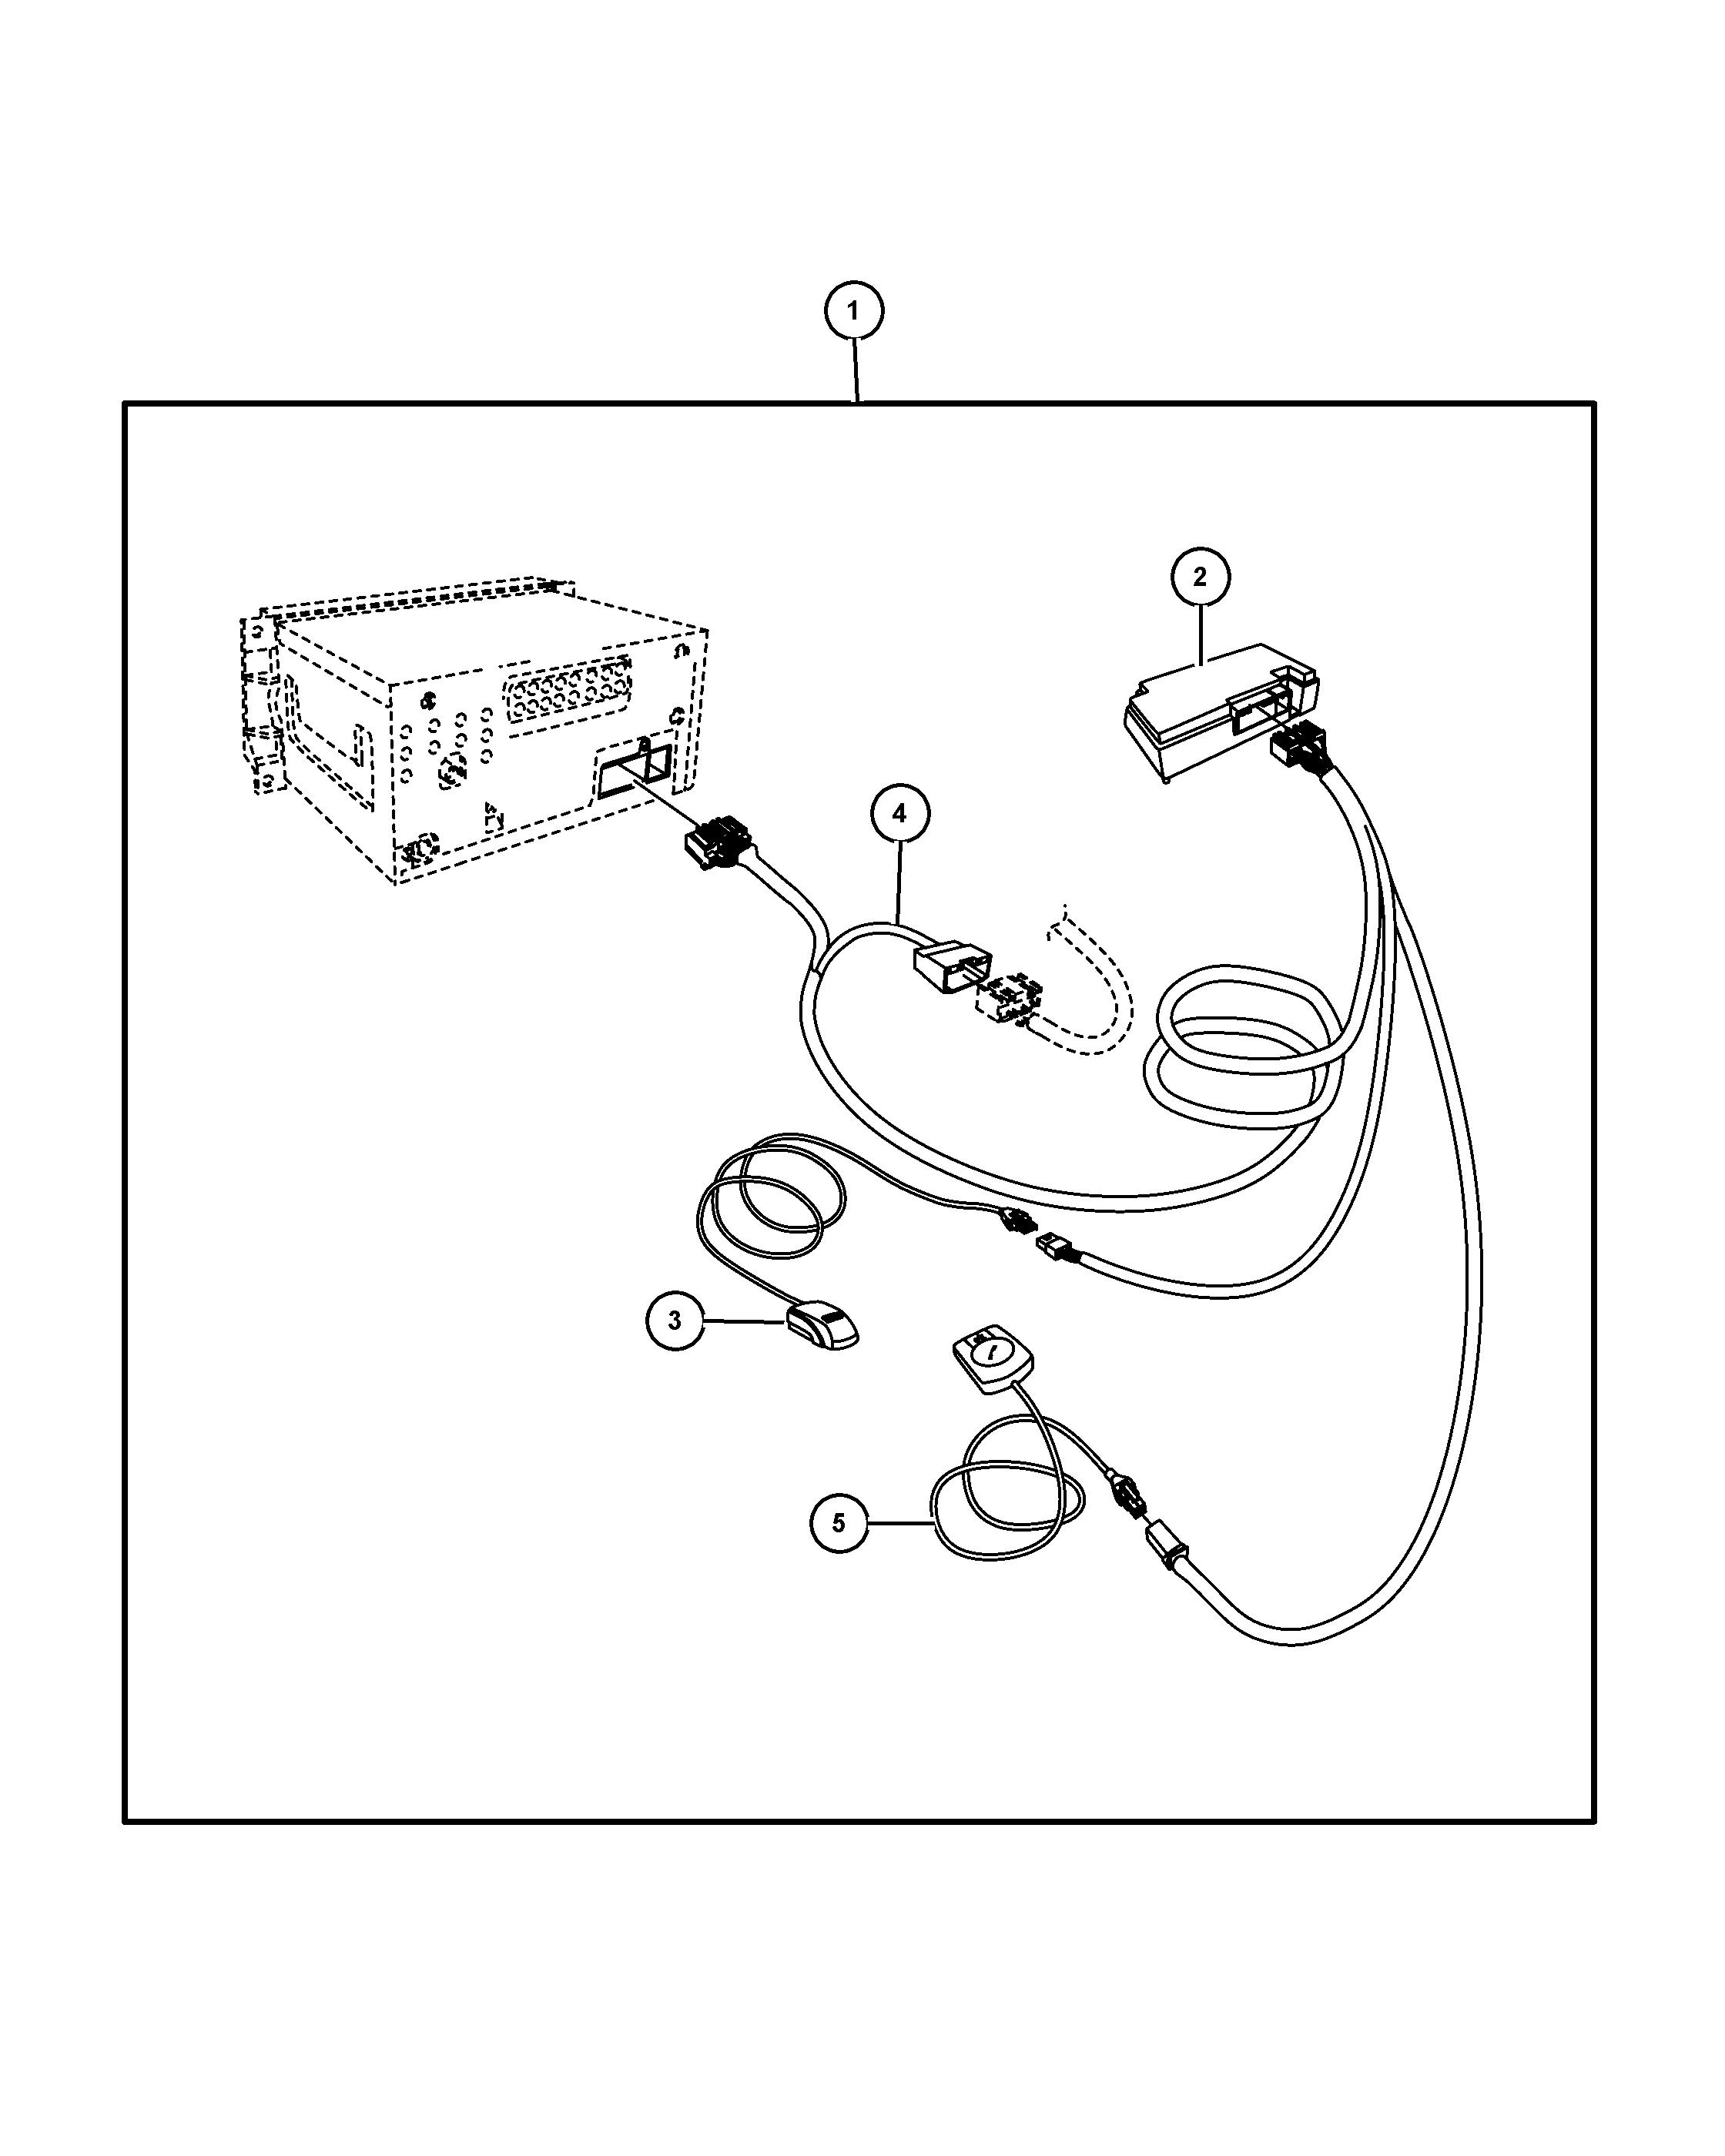 chrysler 2015 bu jeep renegade 1 mopar accessories ponent 2001 Chrysler 300M Speakers parts